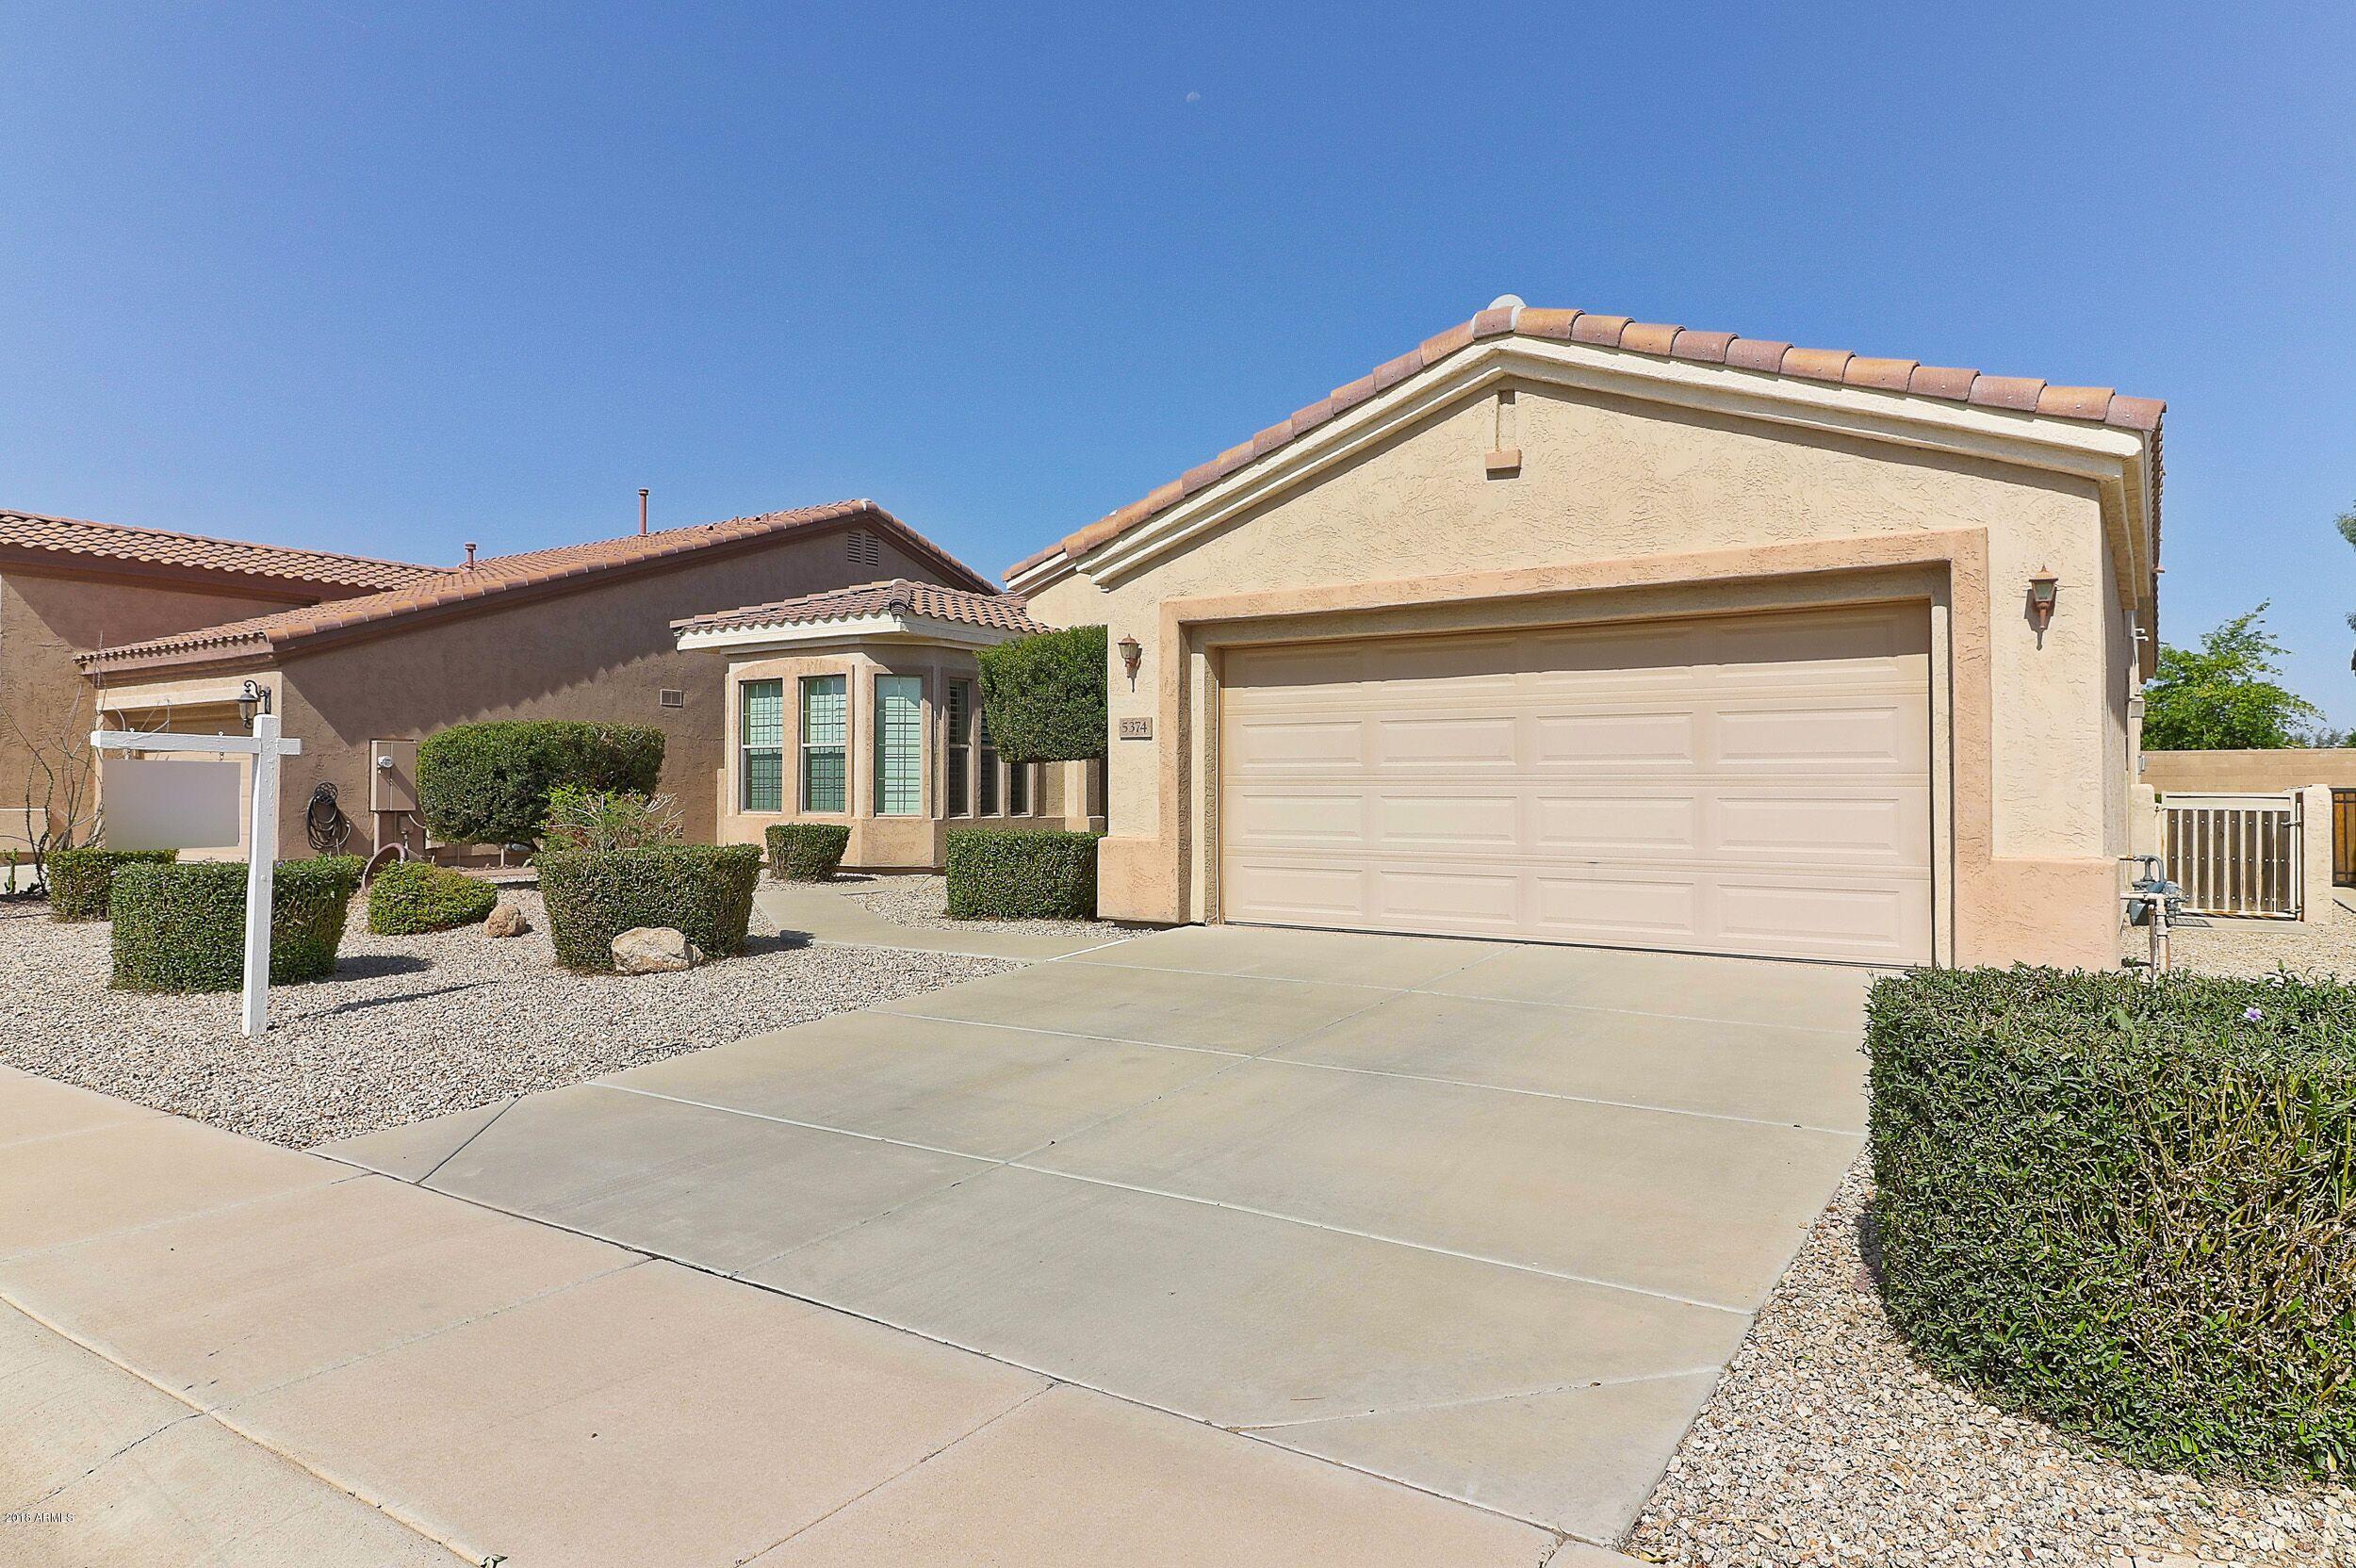 Photo for 5374 S Marigold Way, Gilbert, AZ 85298 (MLS # 5729786)